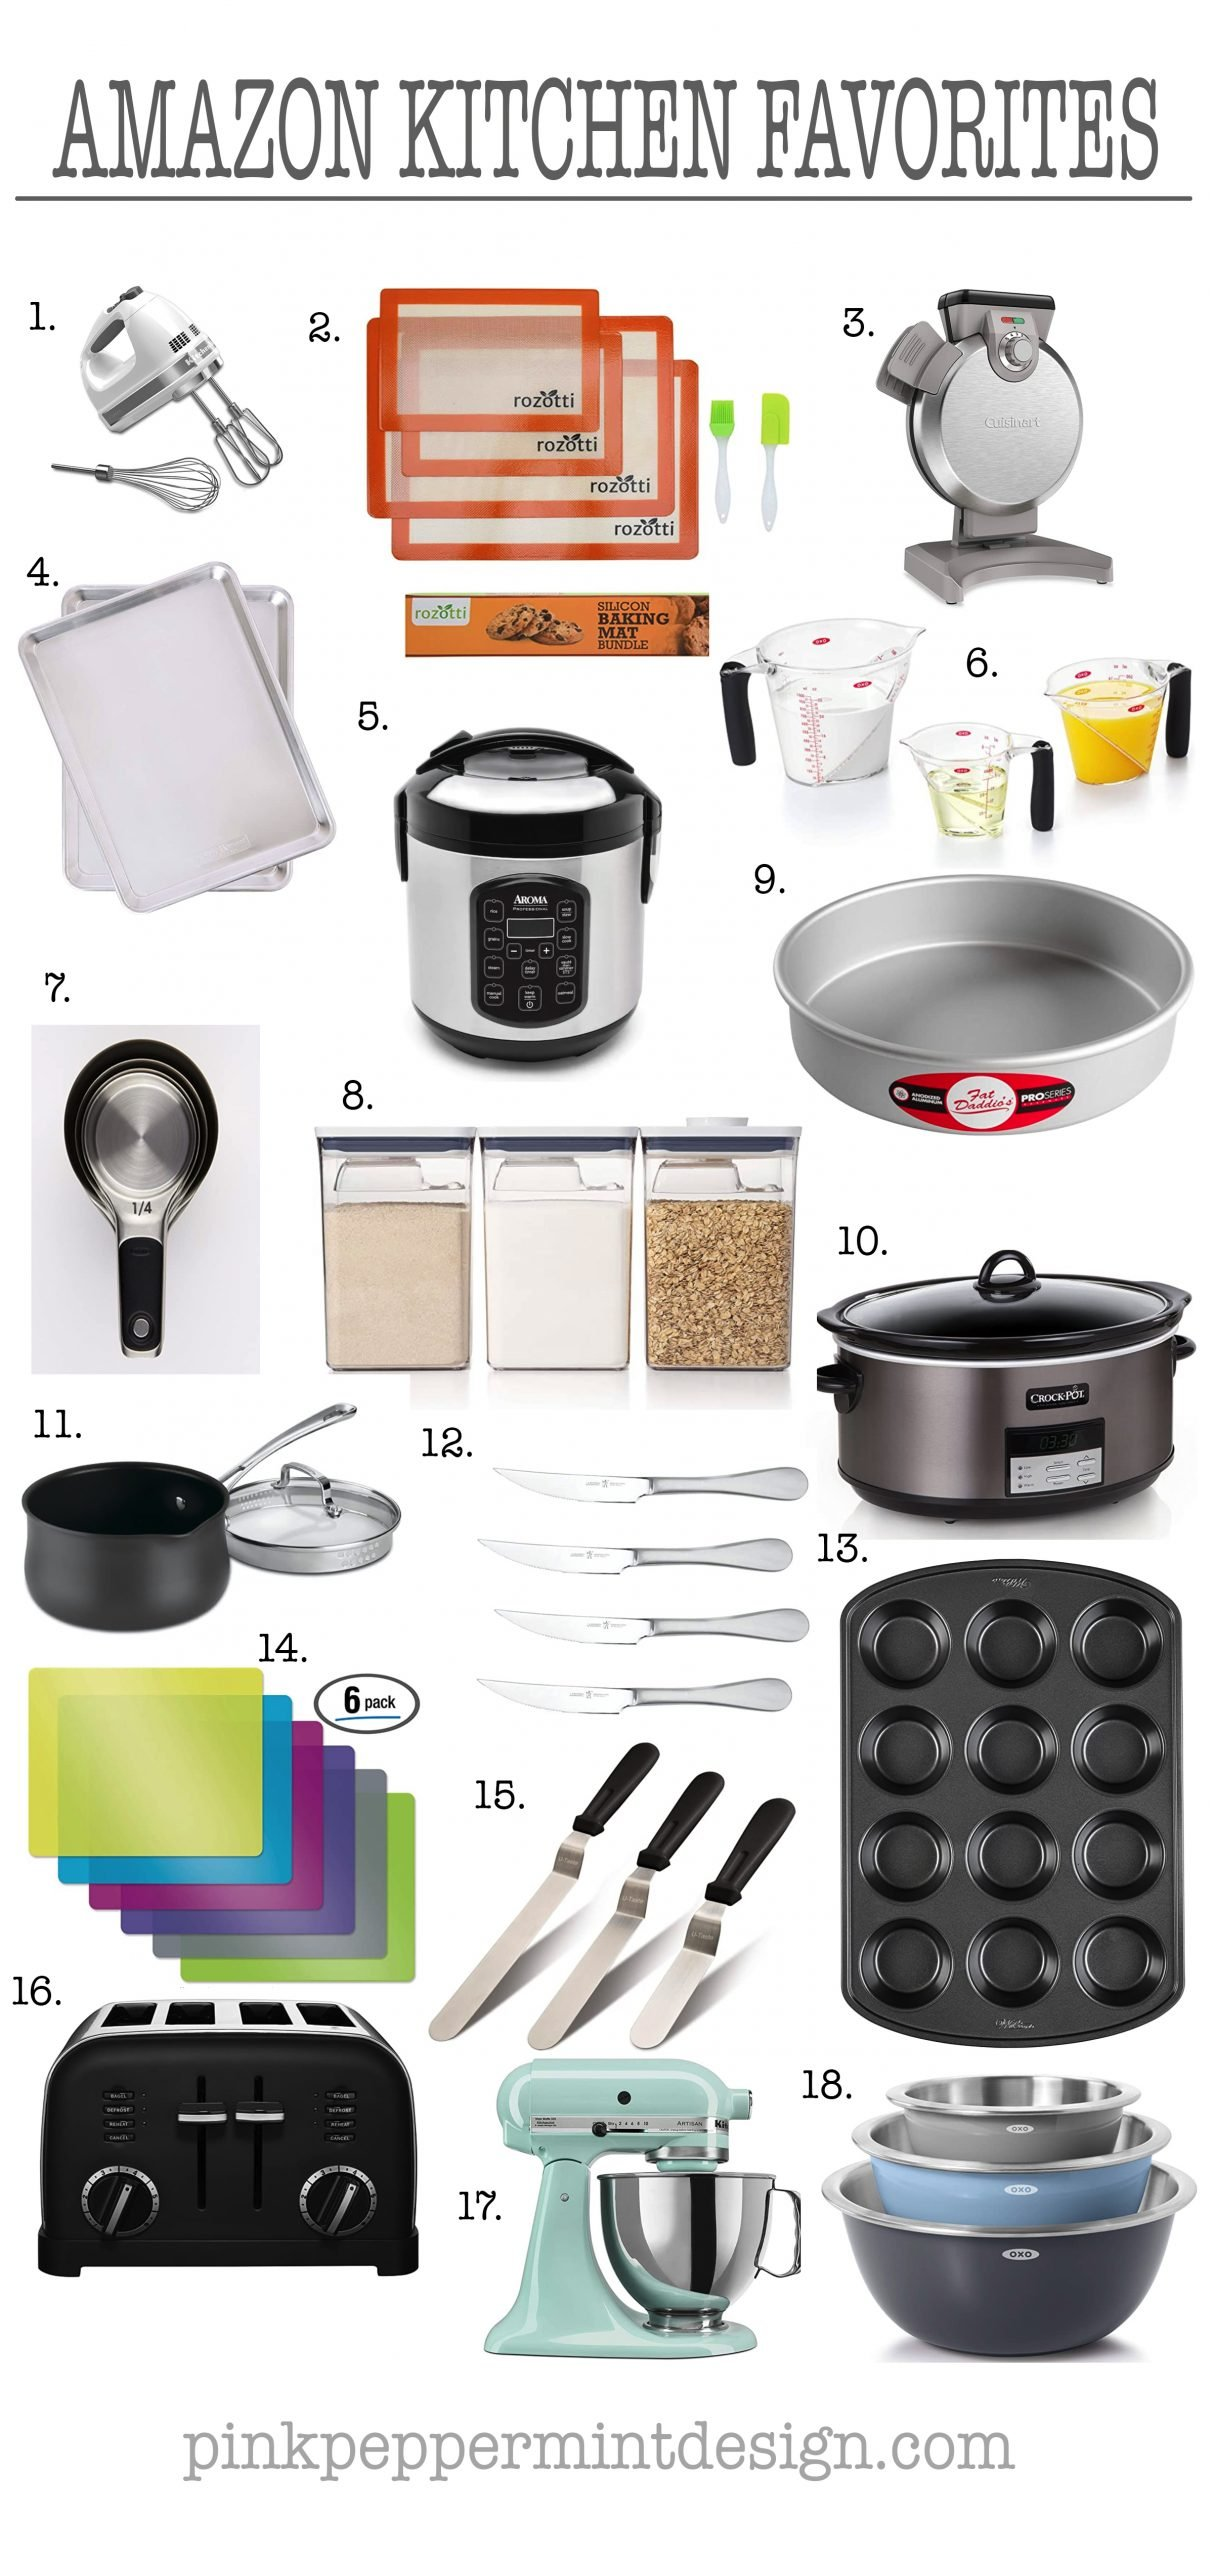 Amazon kitchen products